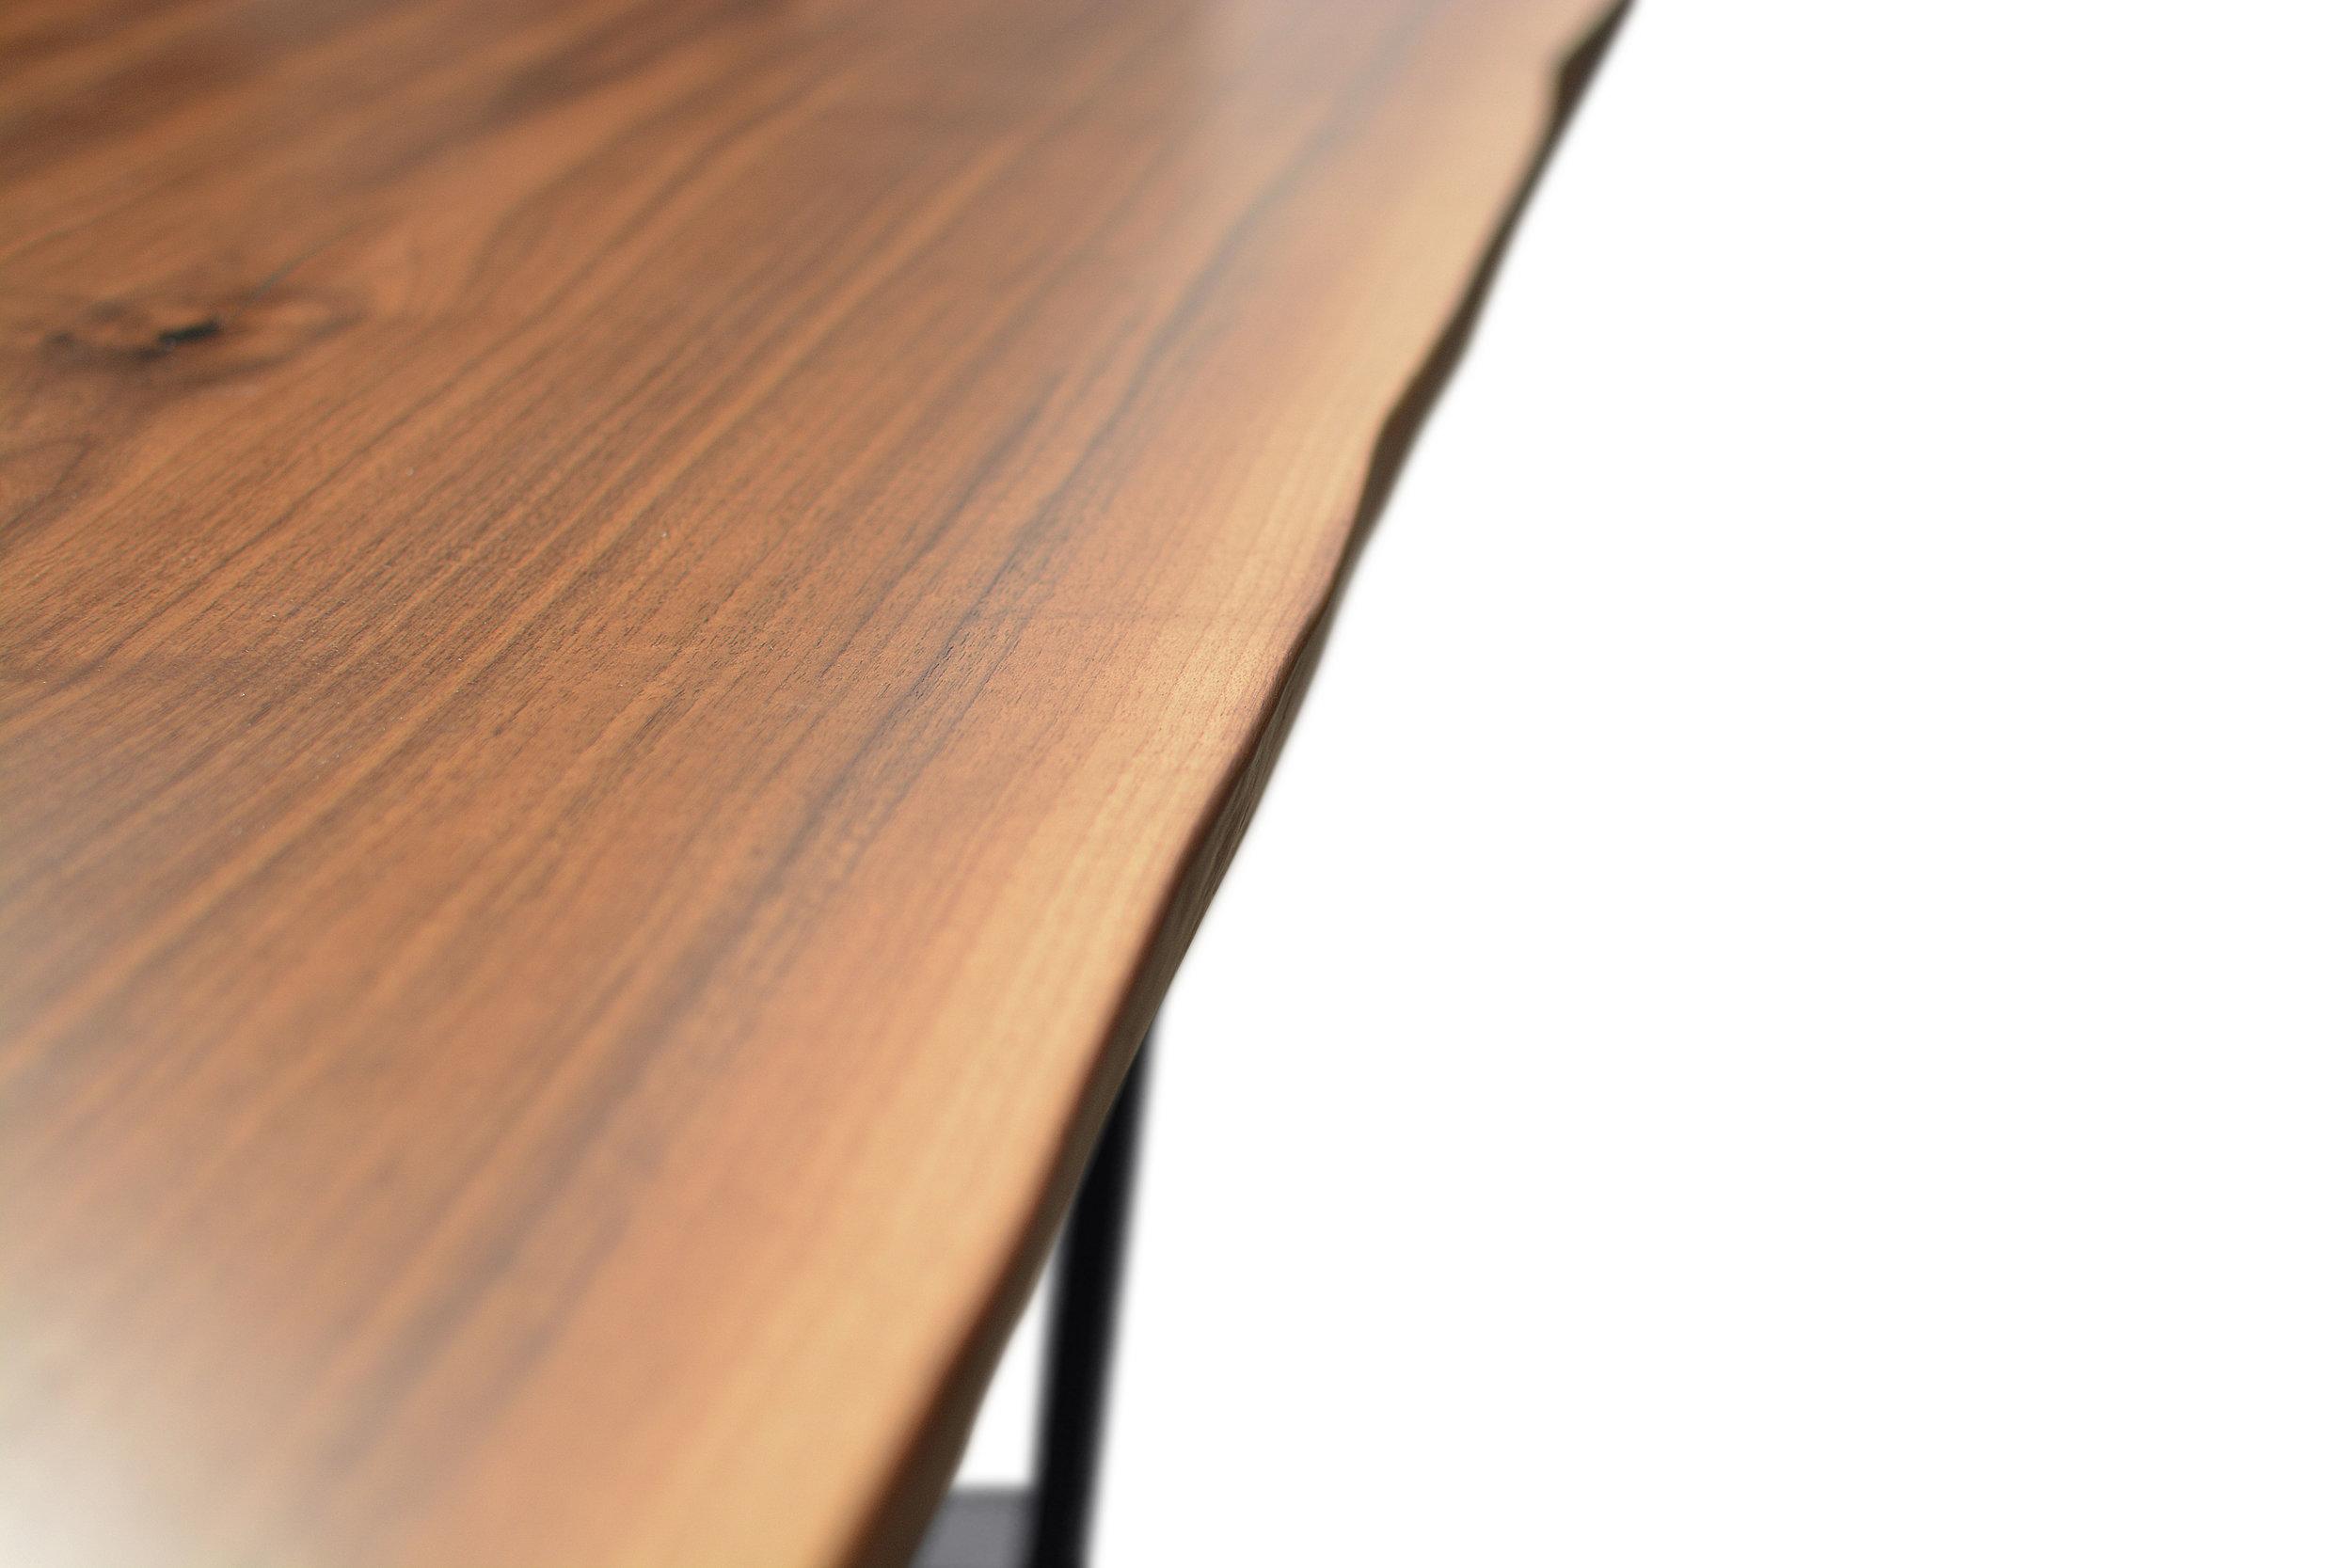 Etz & Steel Hermes Live Edge Walnut Table Close Up 19.JPG